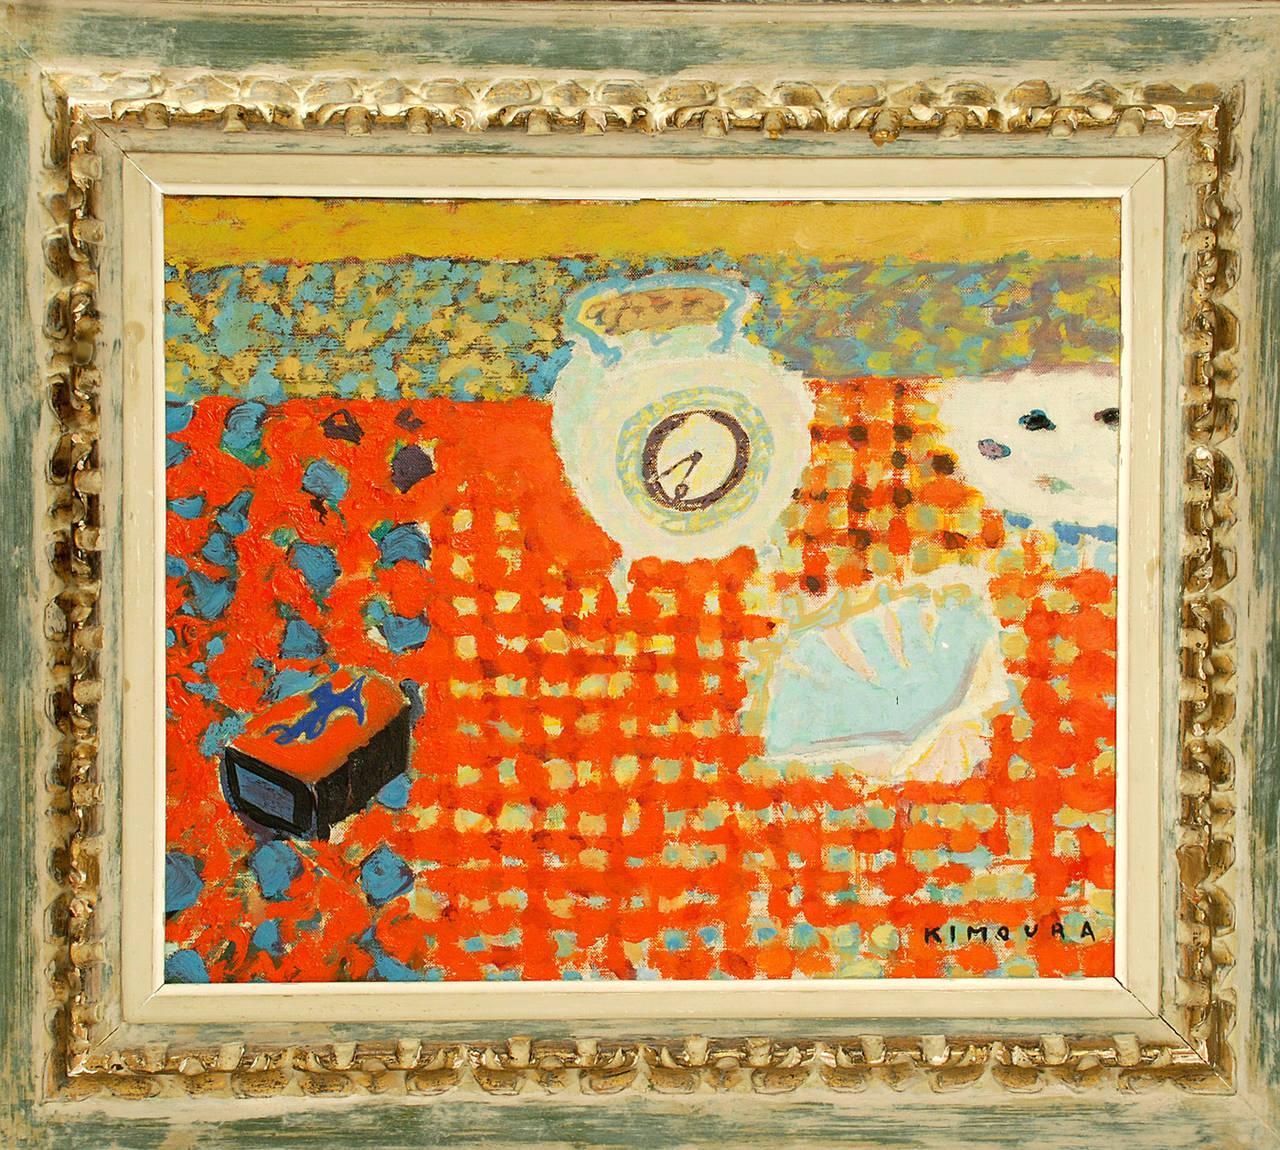 vintage kimoura oil on canvas reveil matin 1956 at 1stdibs. Black Bedroom Furniture Sets. Home Design Ideas